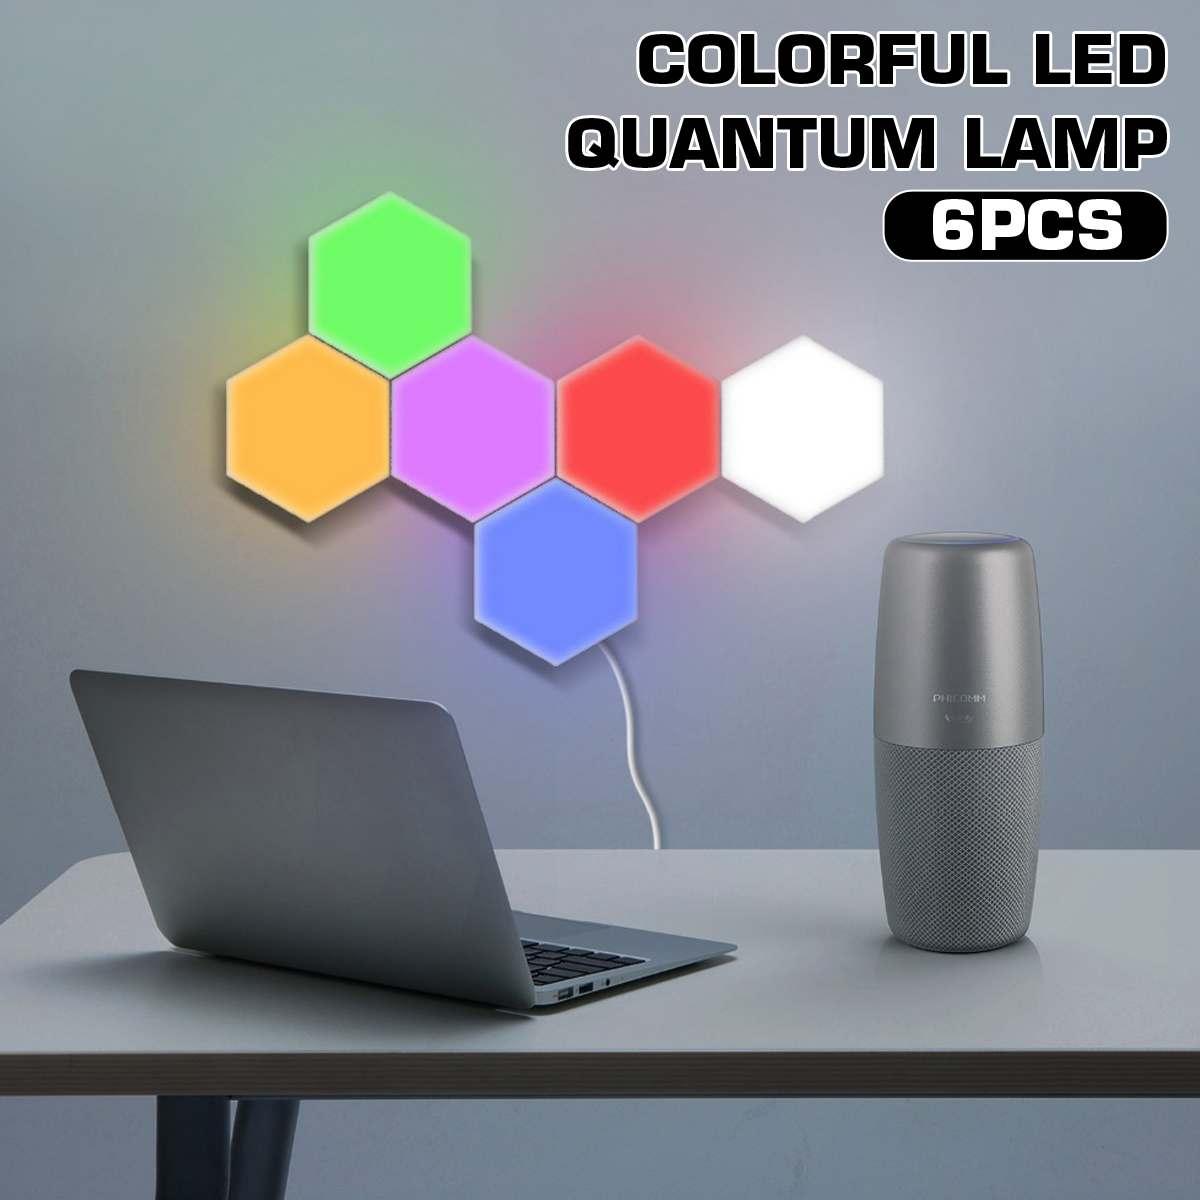 Smuxi 6 Pcs Touch Sensitive Quantum Light LED Modular Hexagonal Honeycomb Wall Lamp Remote Control Color-Changing Quantum Lamp